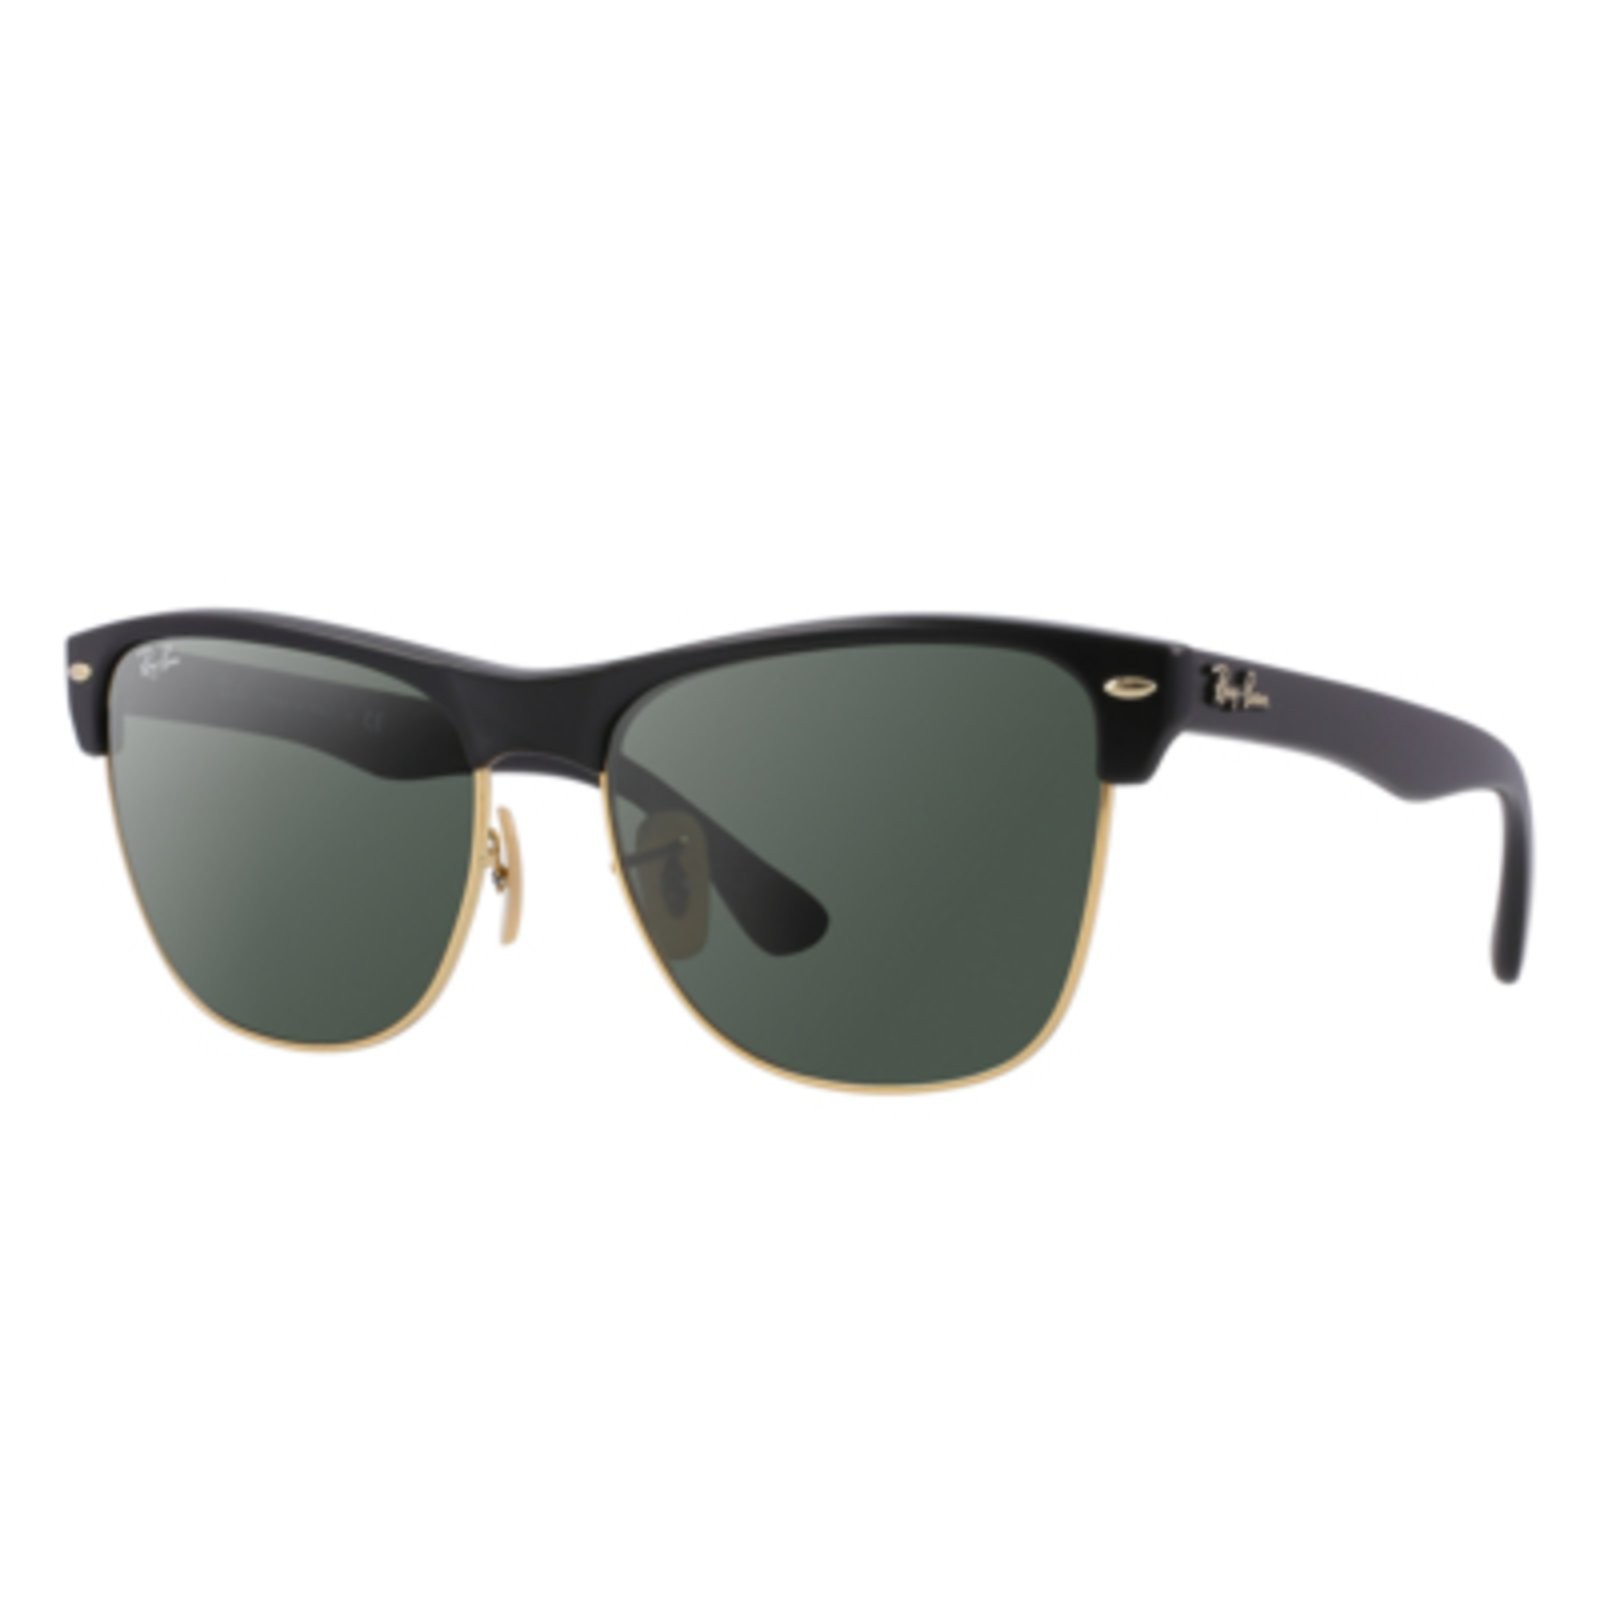 da6138b1ed40c ... reduced Óculos de sol ray ban clubmaster oversized rb4175 ouro compre  agora kanui brasil 86eb5 60742 ...